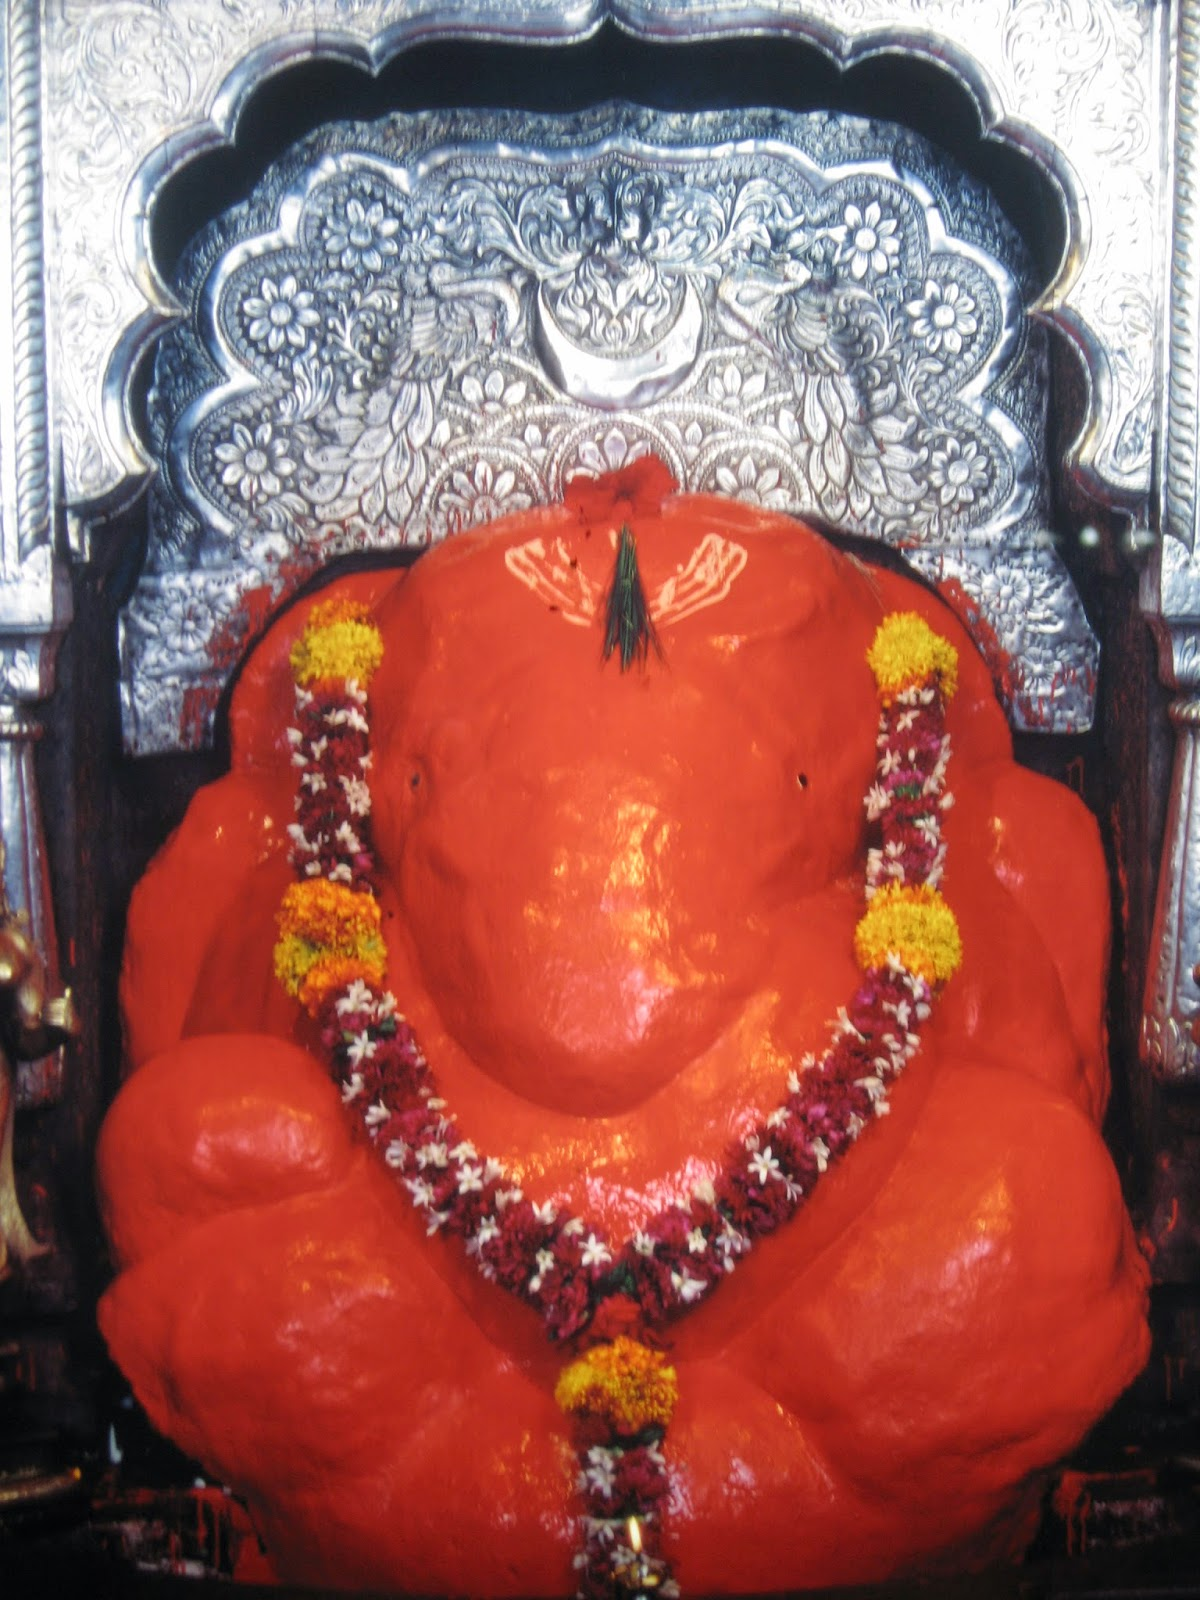 Shri Mahaganapati, Ranjangaon, Ashtavinayak temple, Maharastra, Ganesha Temple, Ganapati Temple